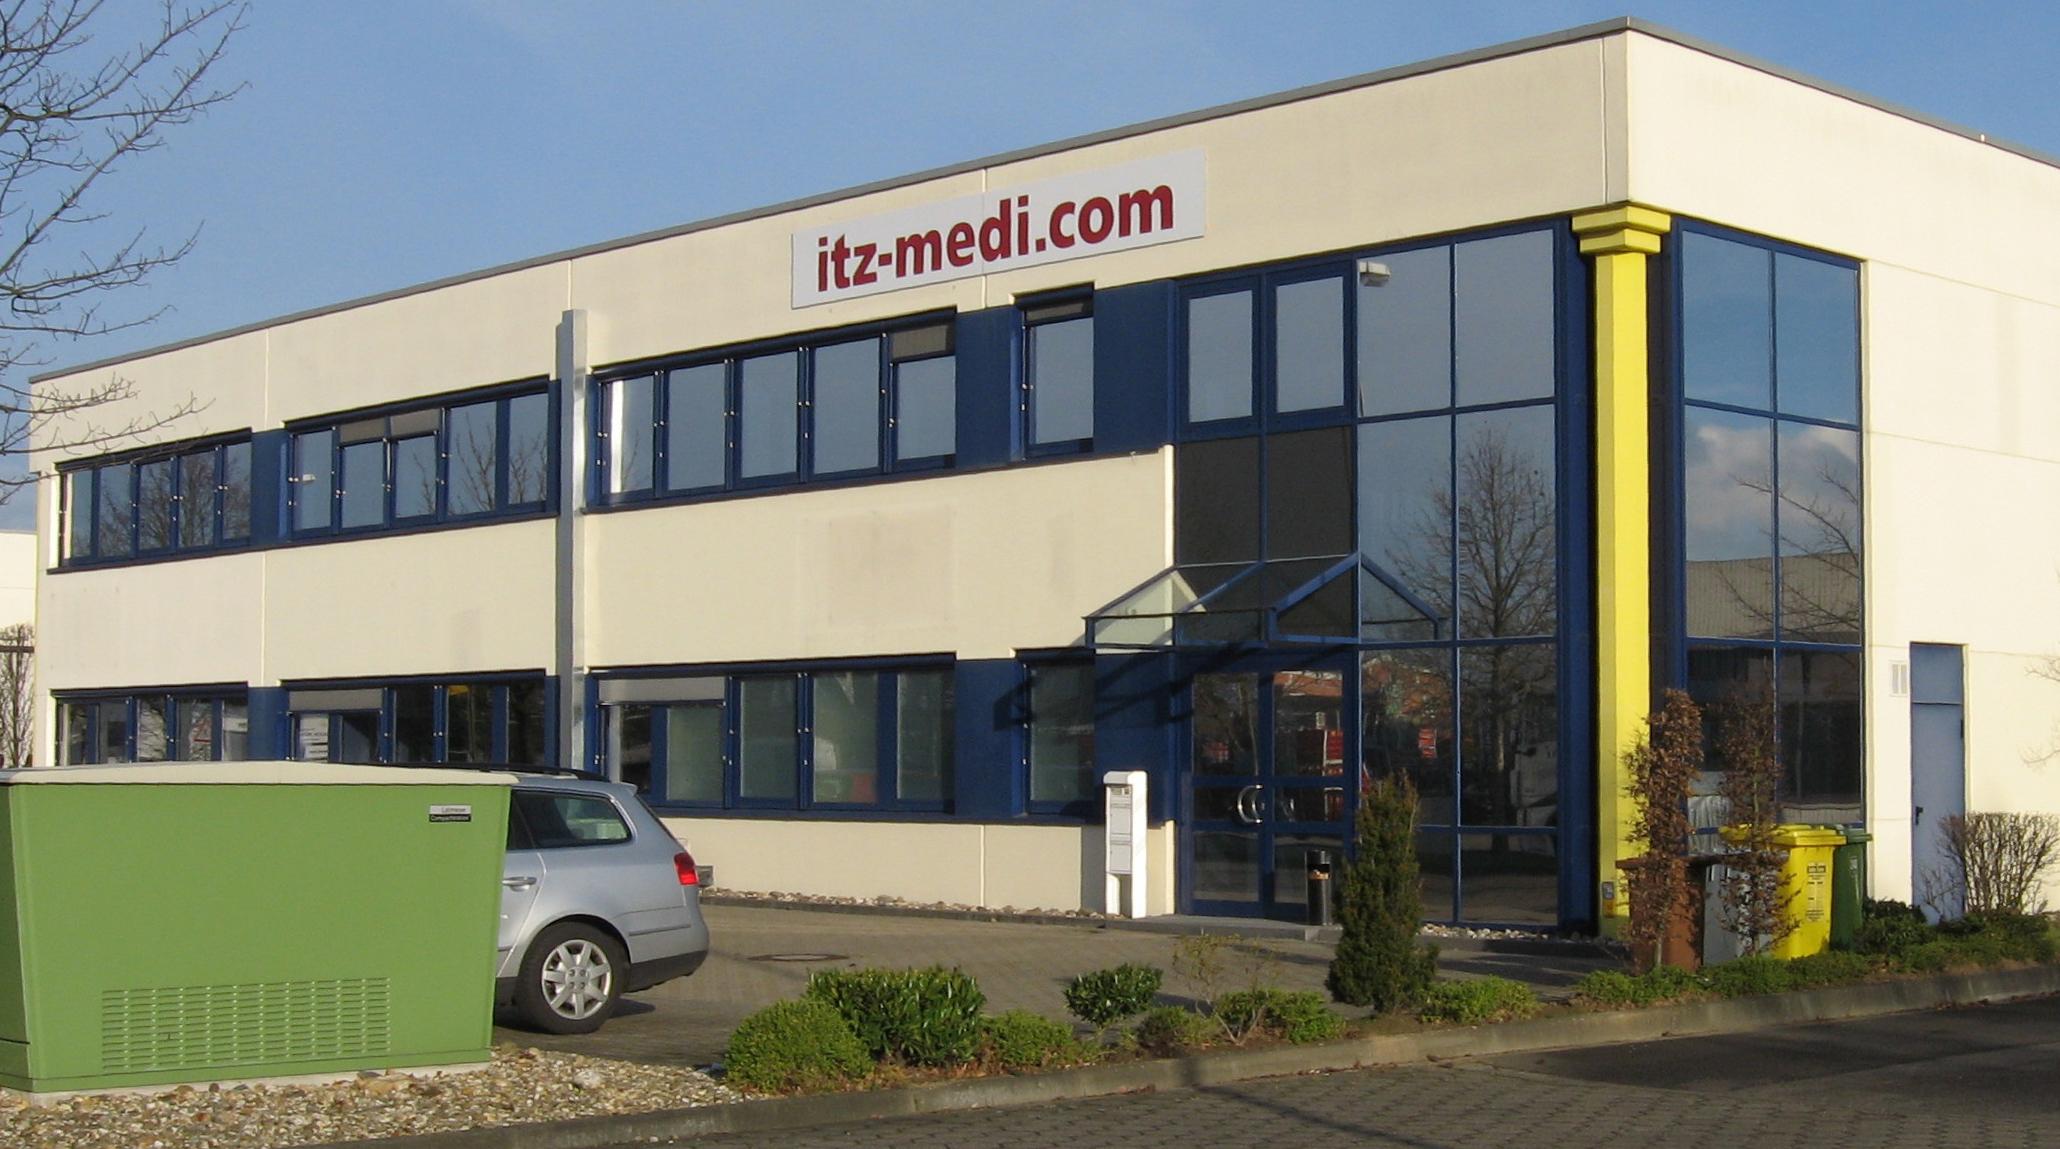 Telemis Group übernimmt ITZ Medicom GmbH & Co. KG